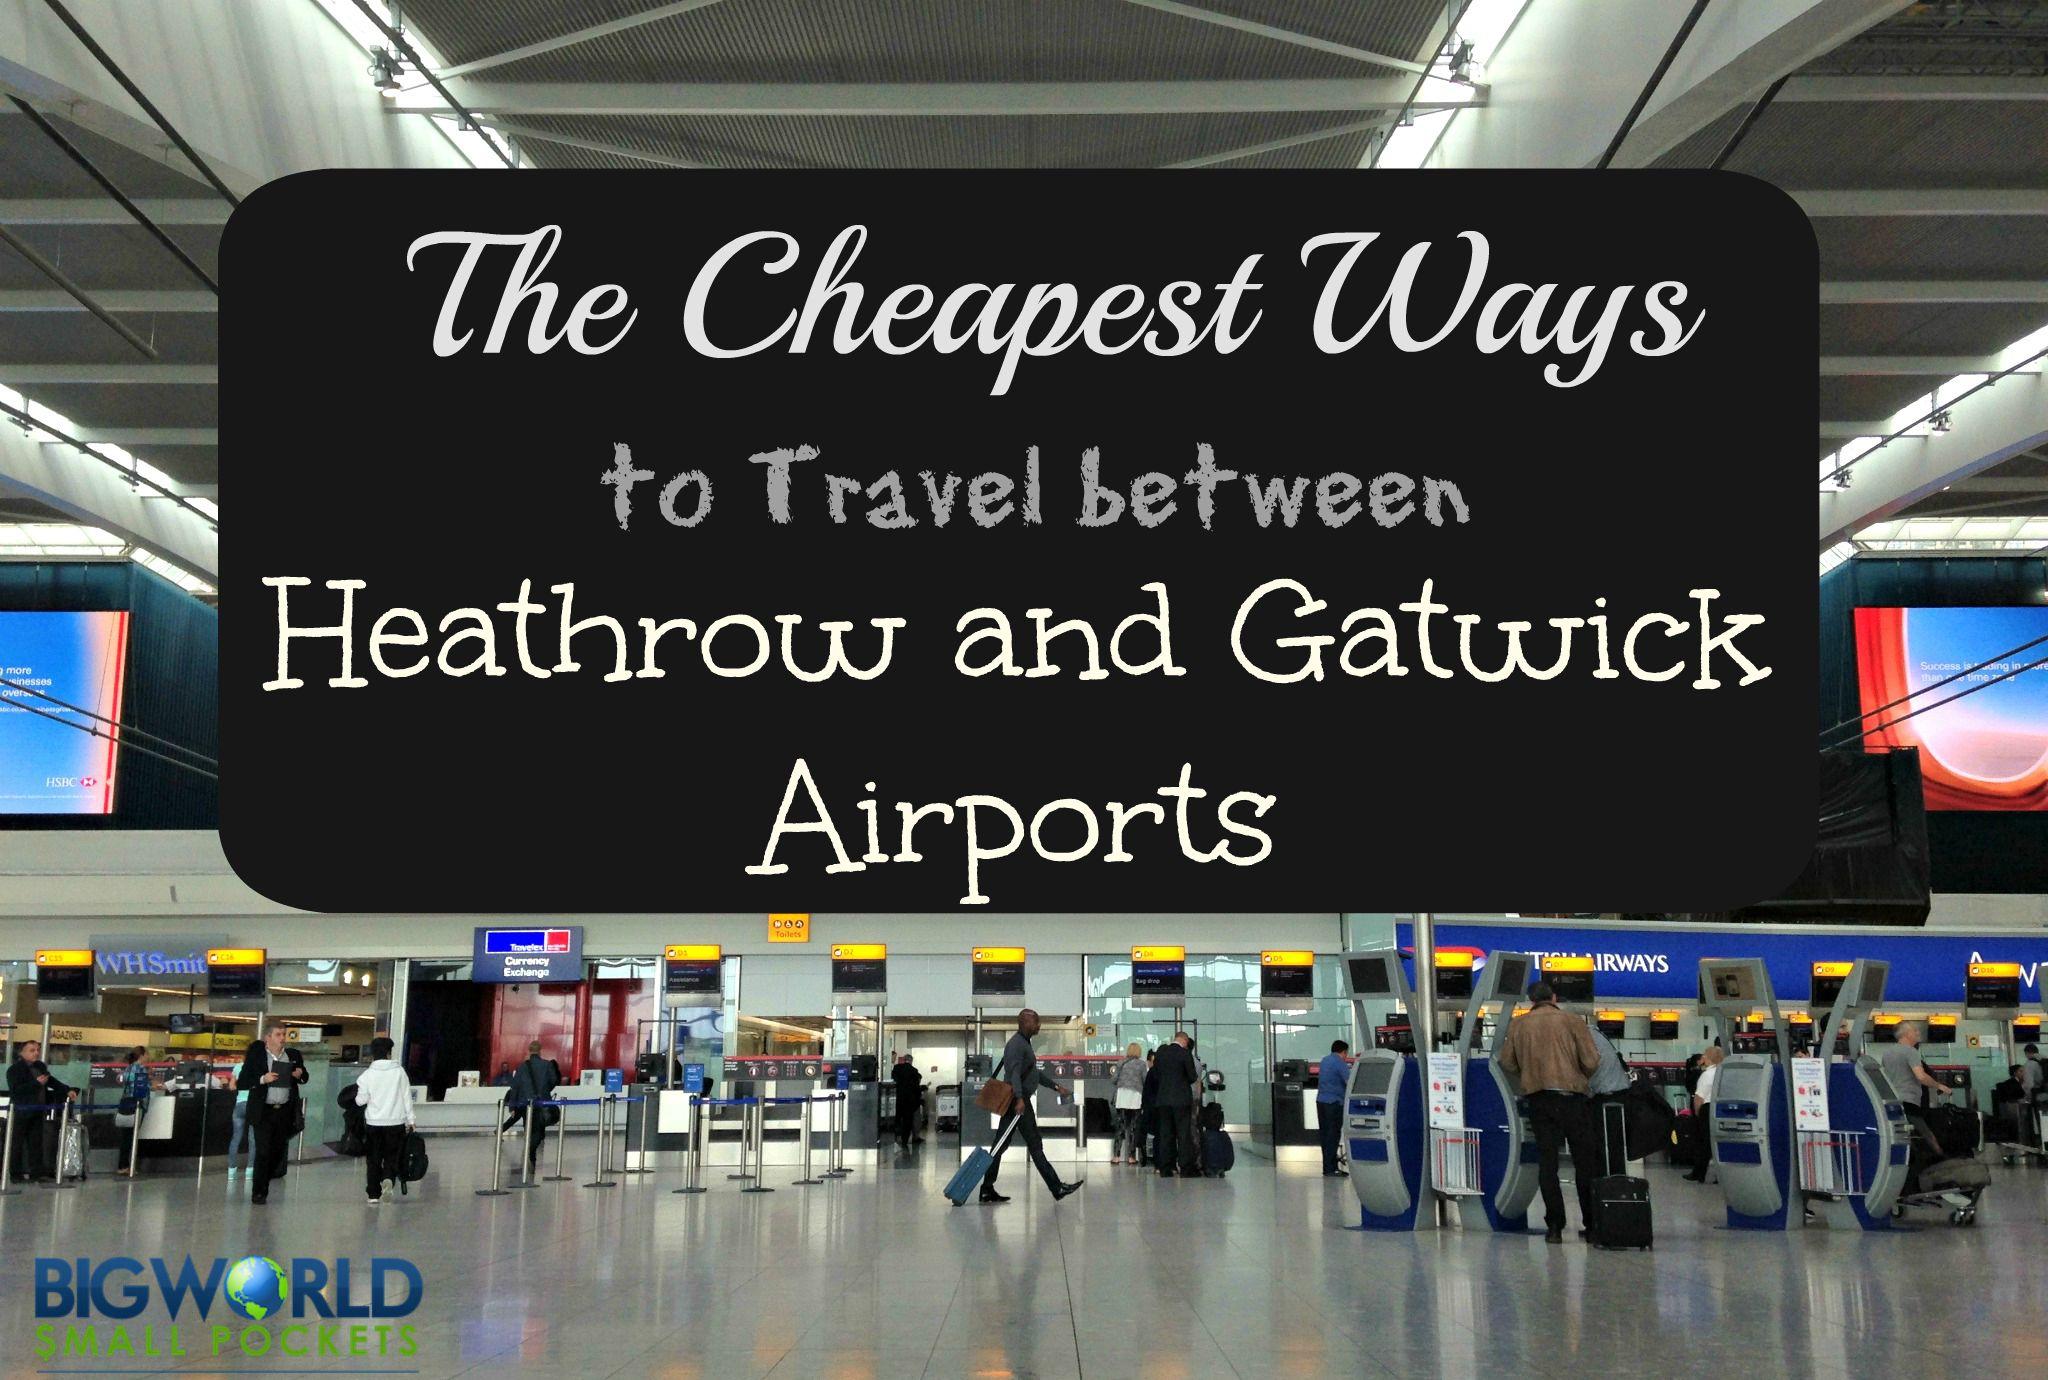 Heathrow and Gatwick